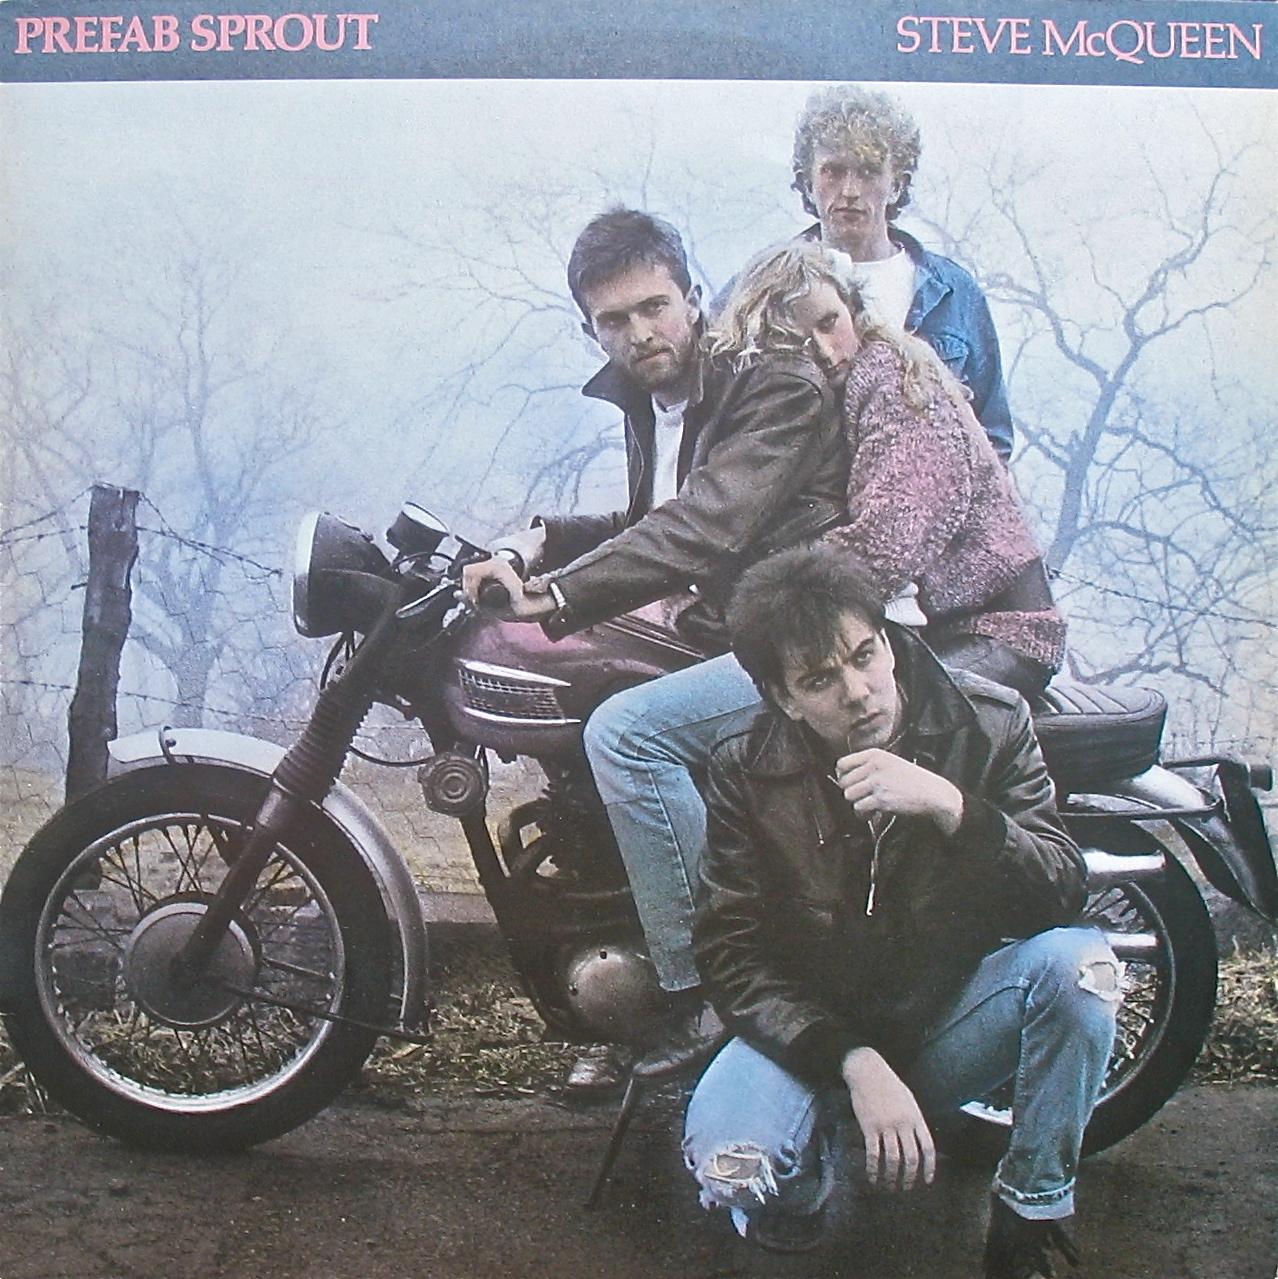 Top 15 Sophisti-Pop Albums - Prefab Sprout